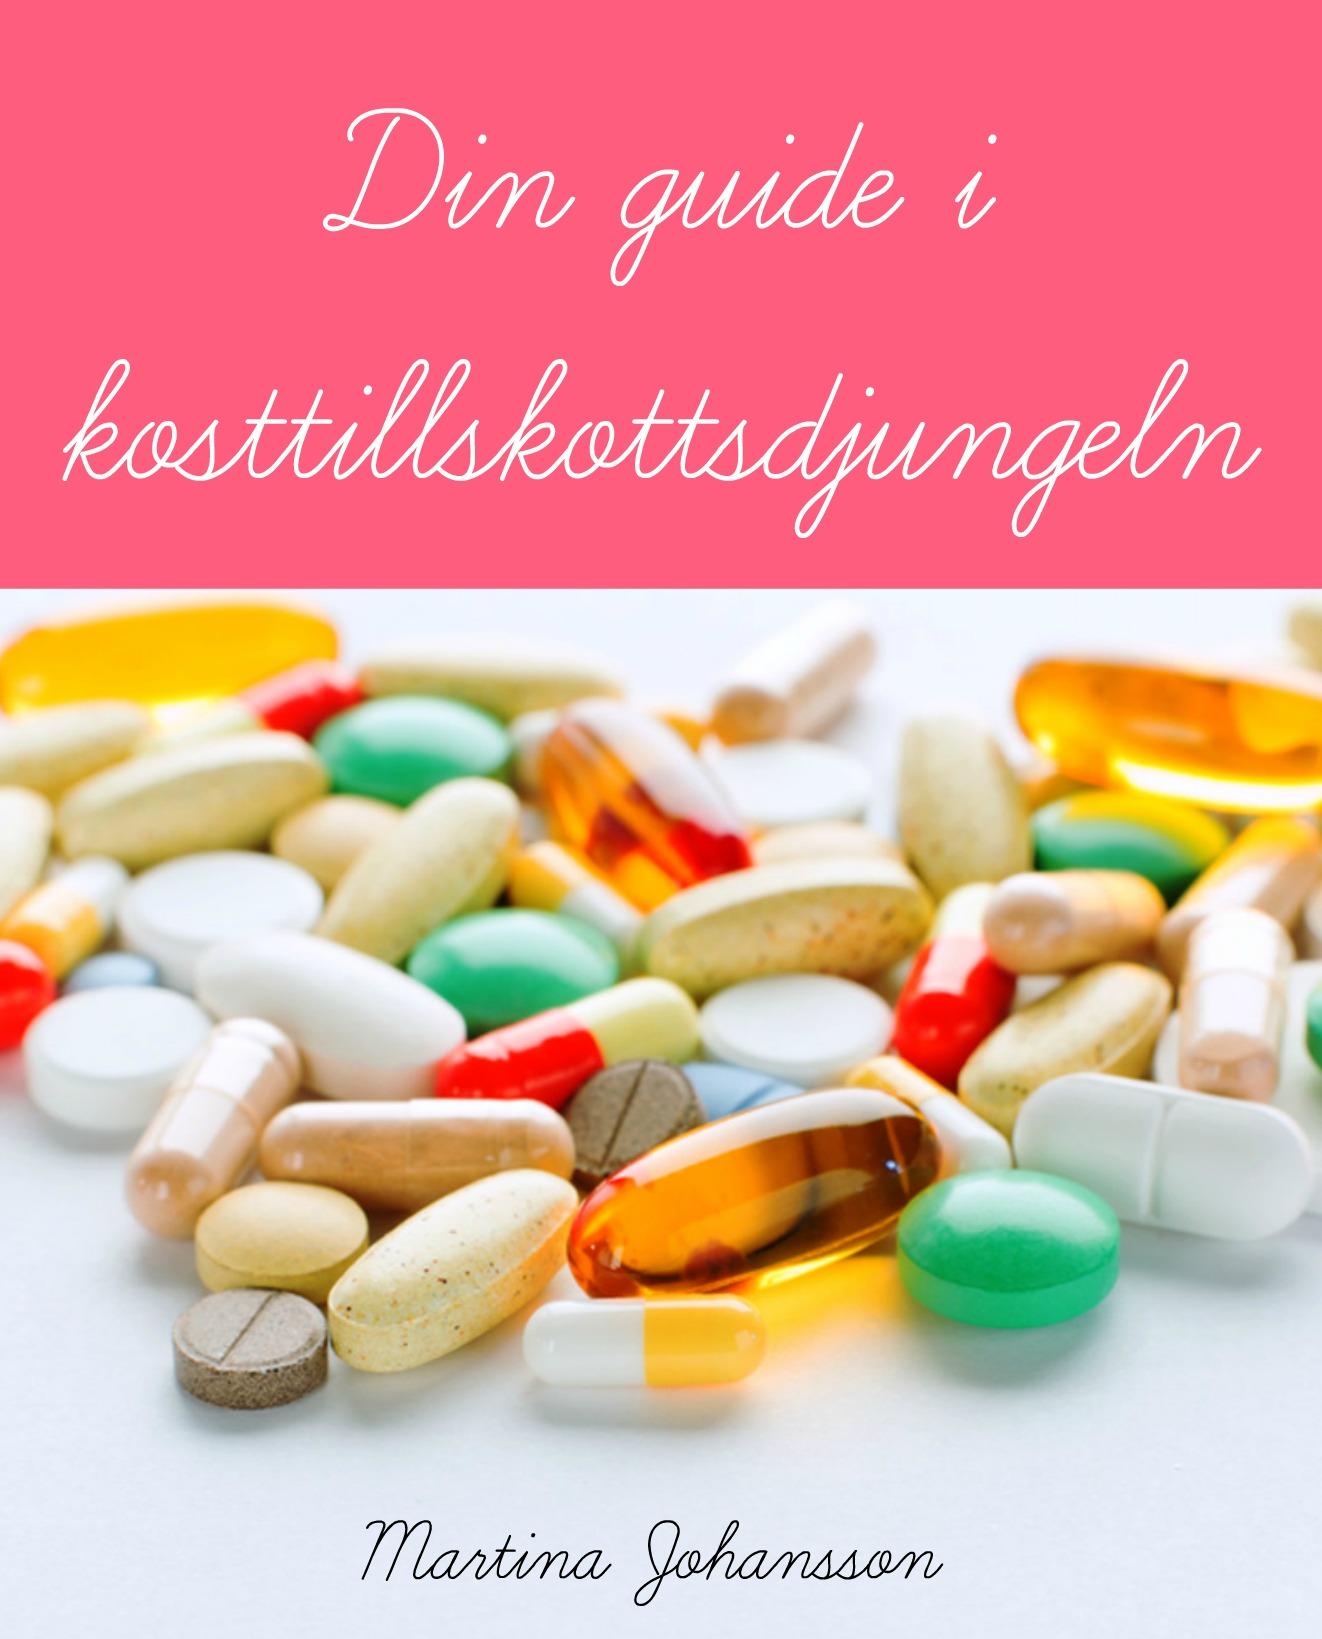 E-bok om kosttillskott